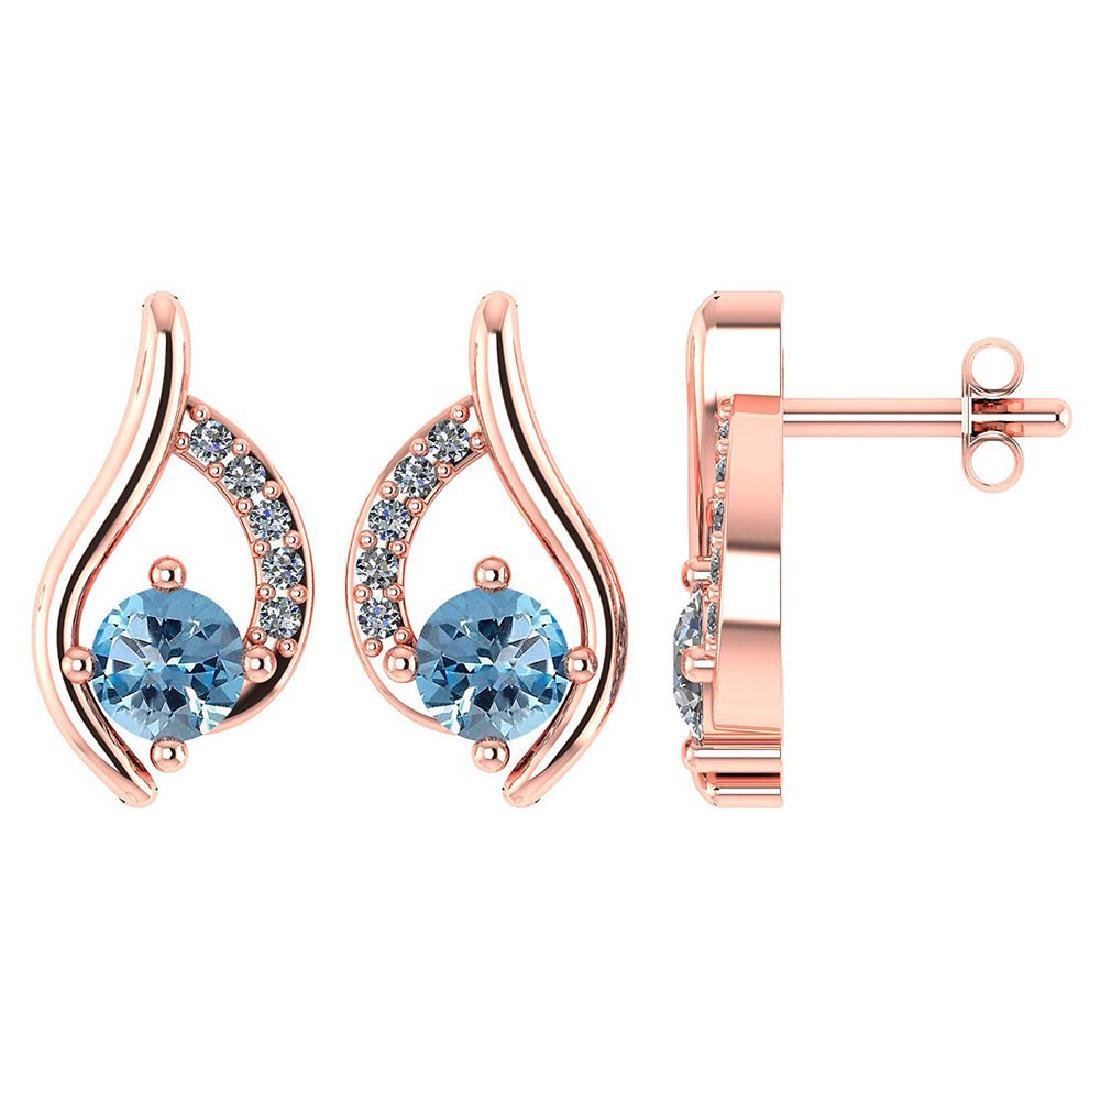 Certified .51 CTW Genuine Aquamarine And Diamond (G-H/S